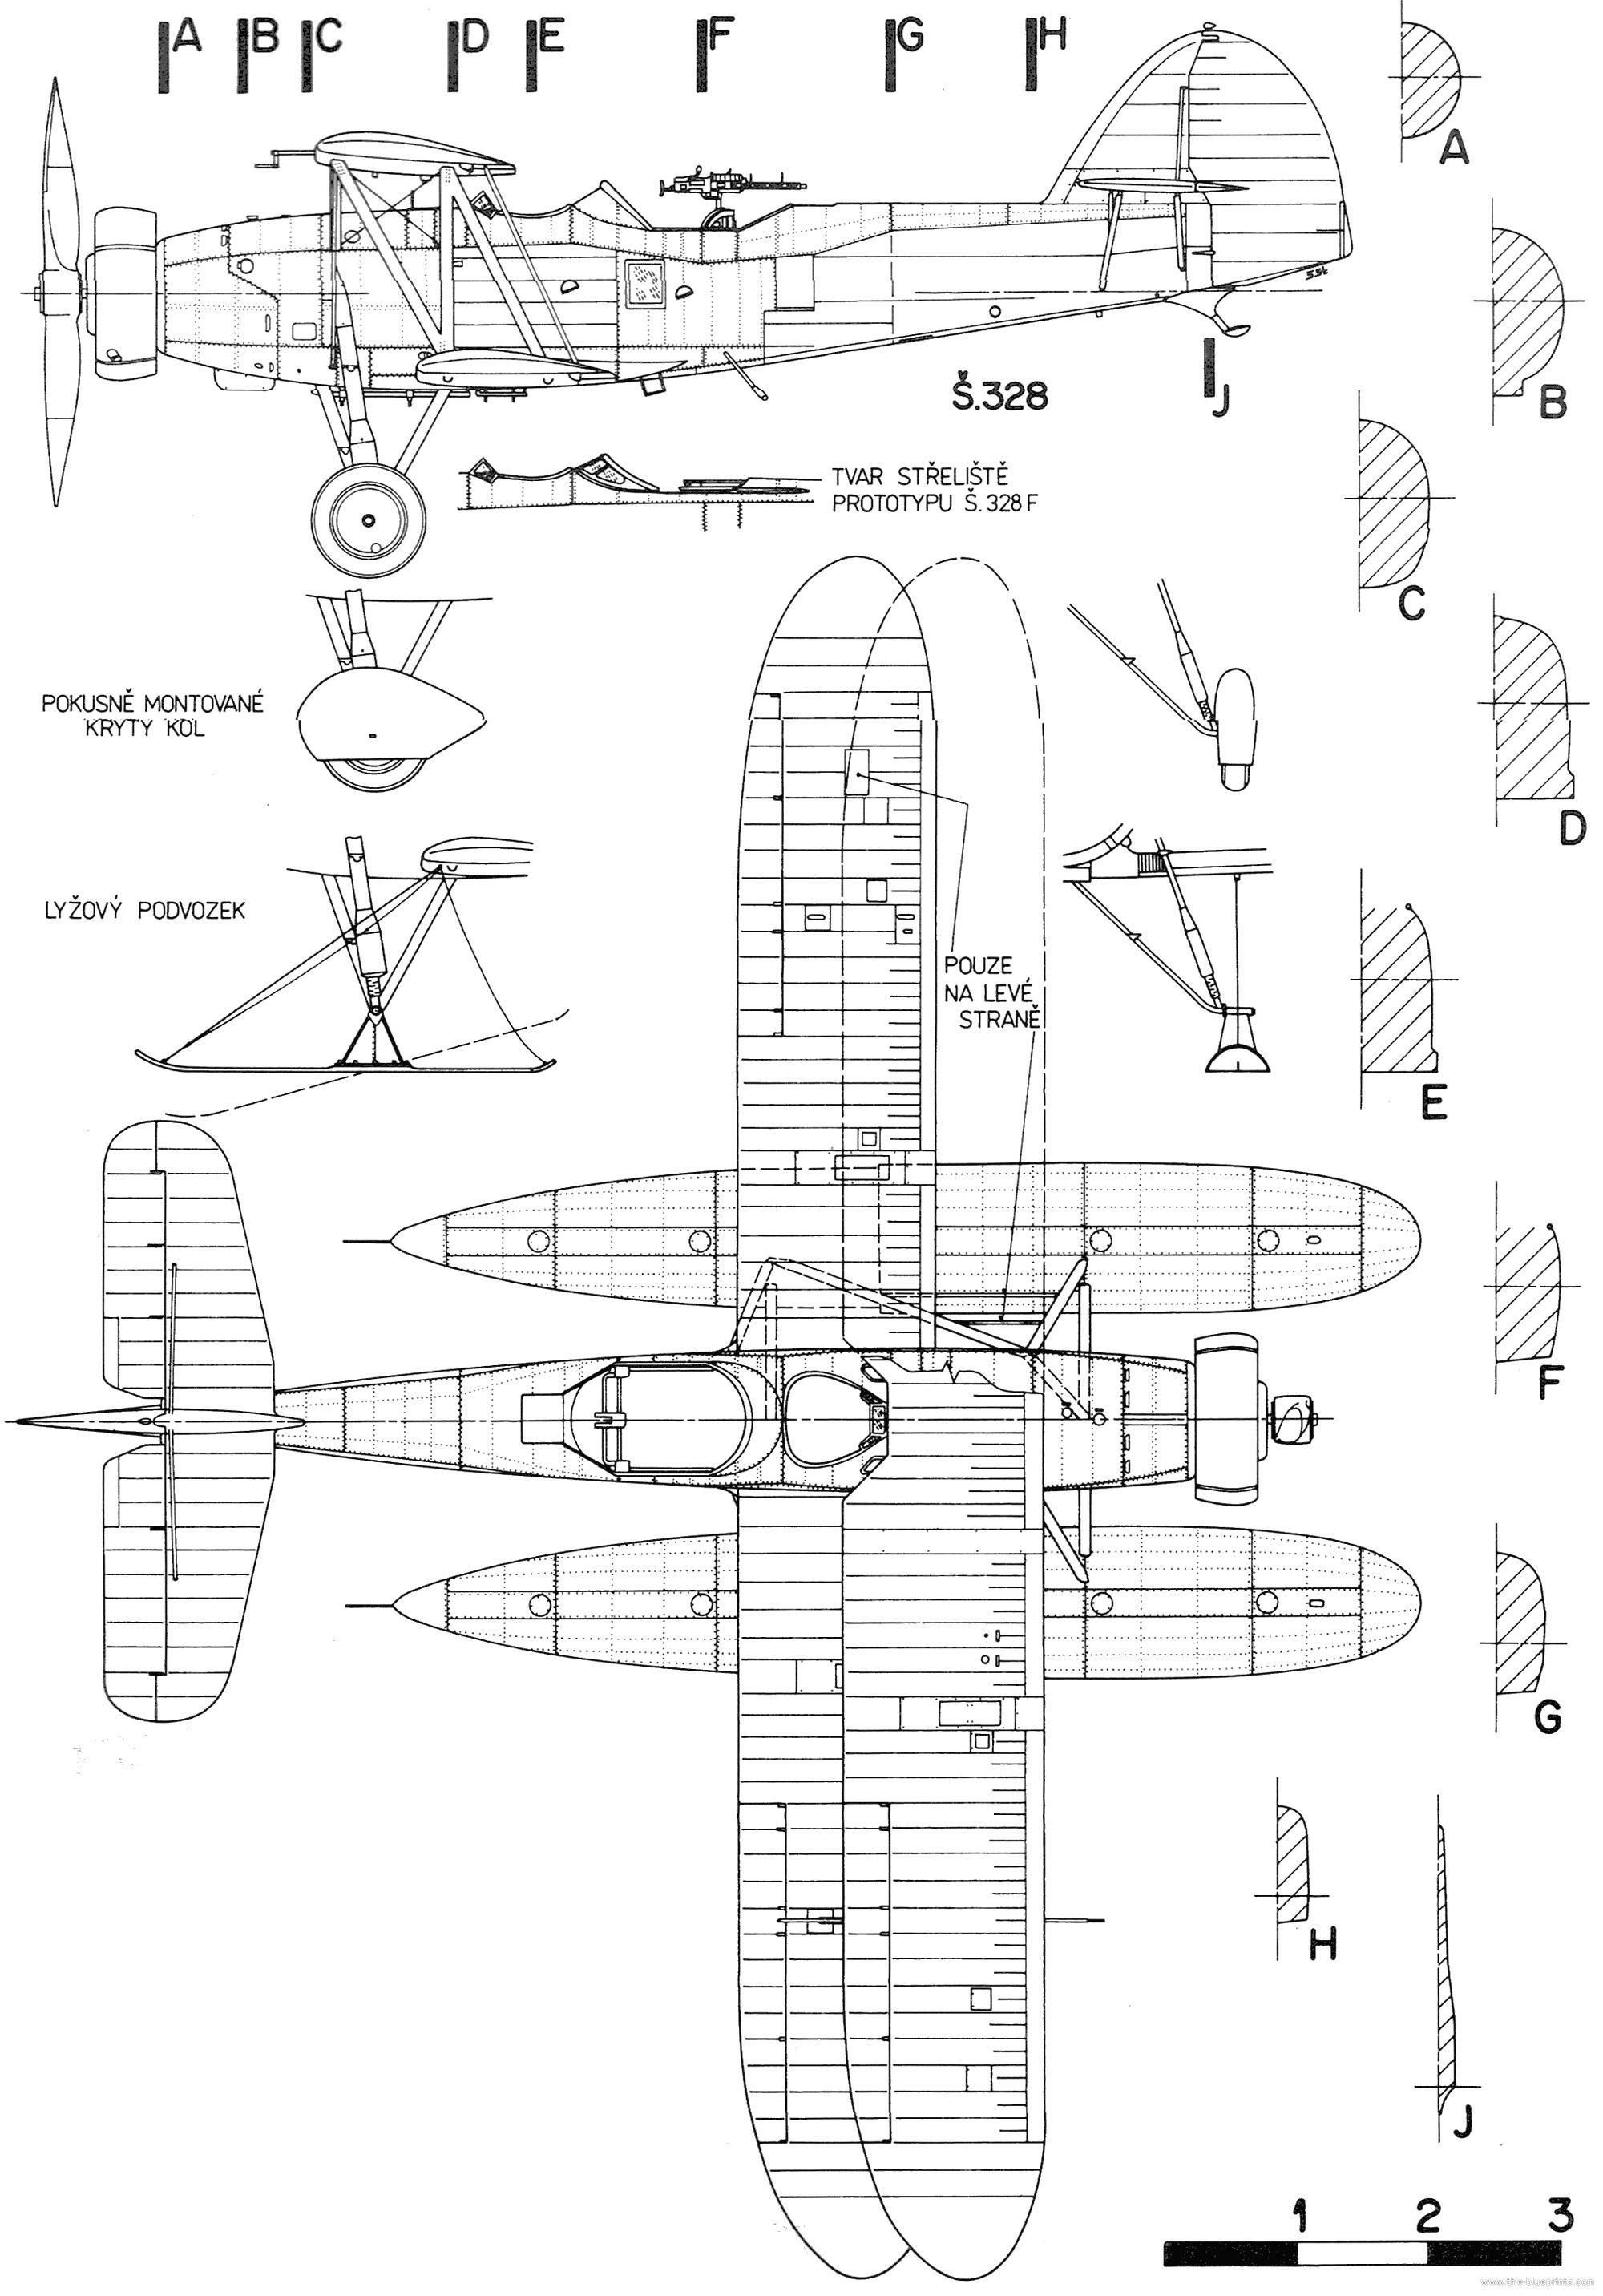 letov-s-328,-czechoslovakian-airplane,-1938-2